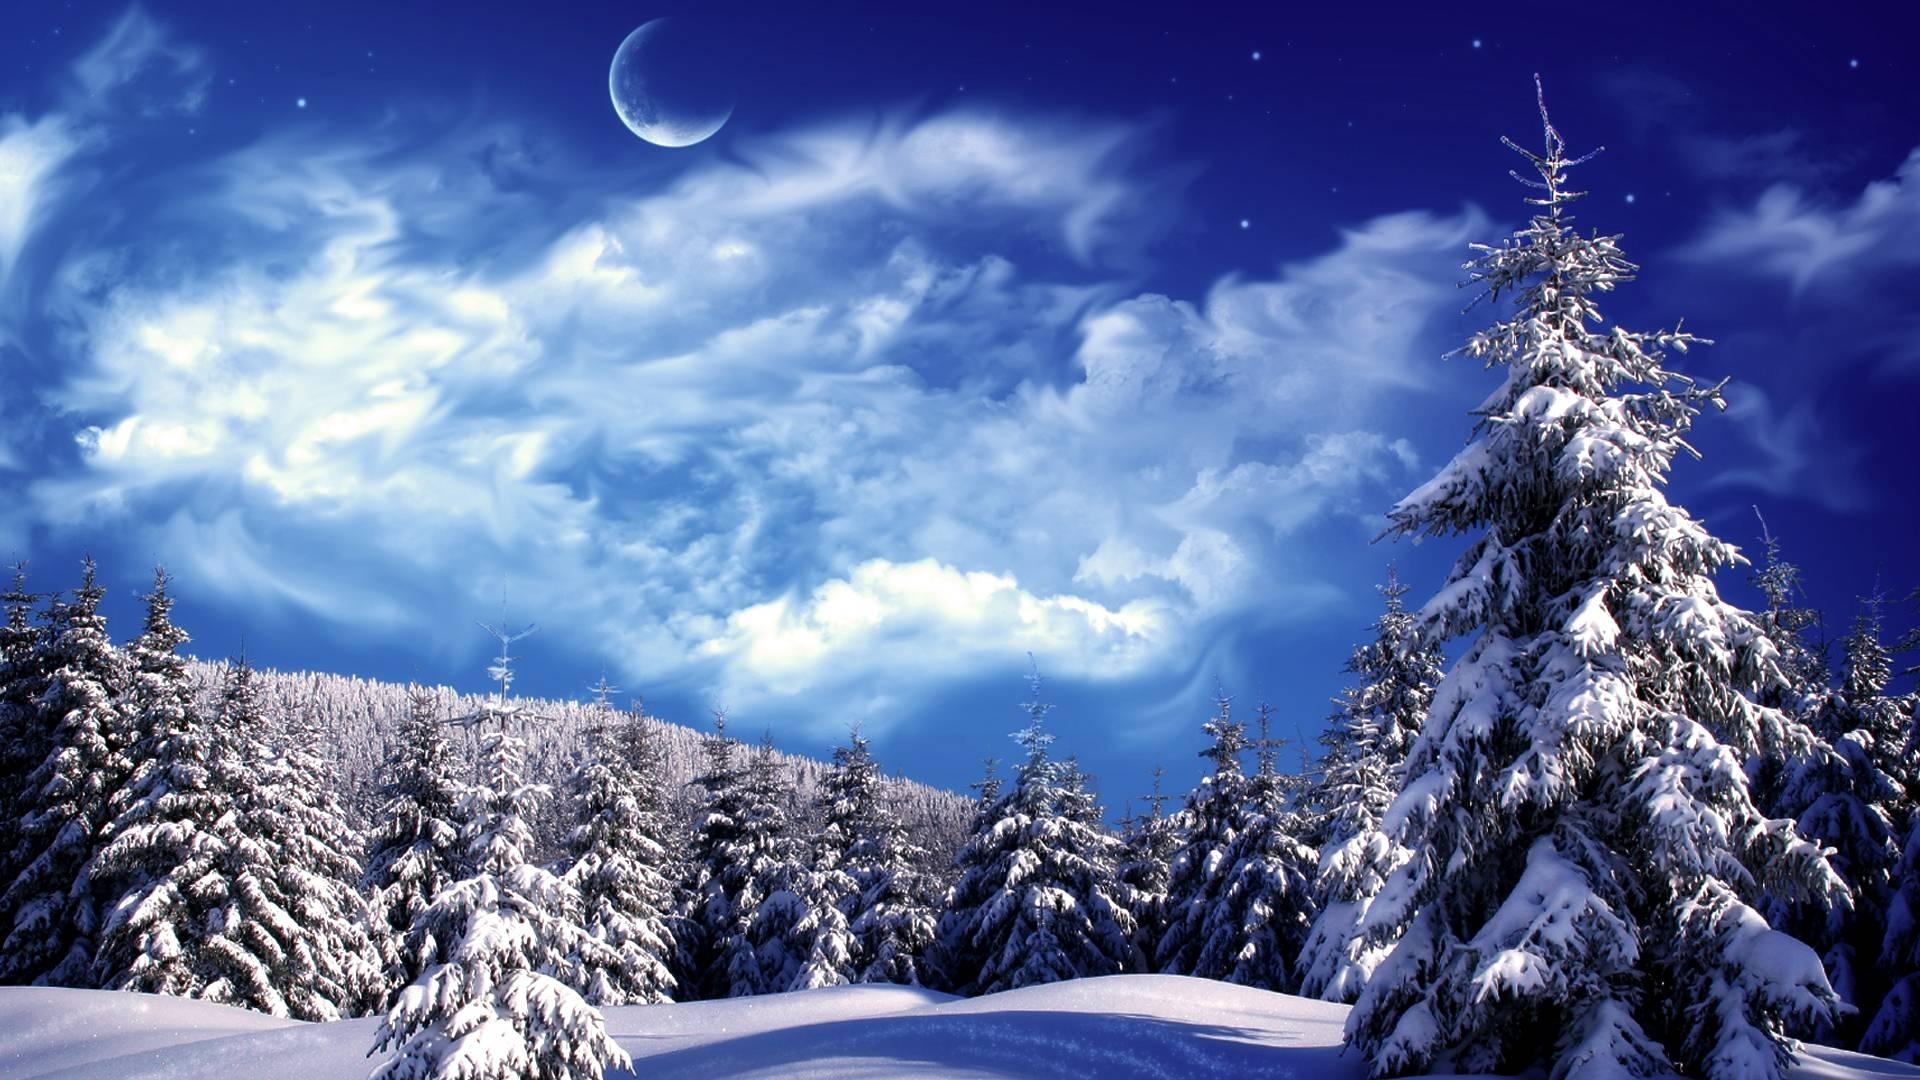 winter wonderland desktop backgrounds - wallpaper cave